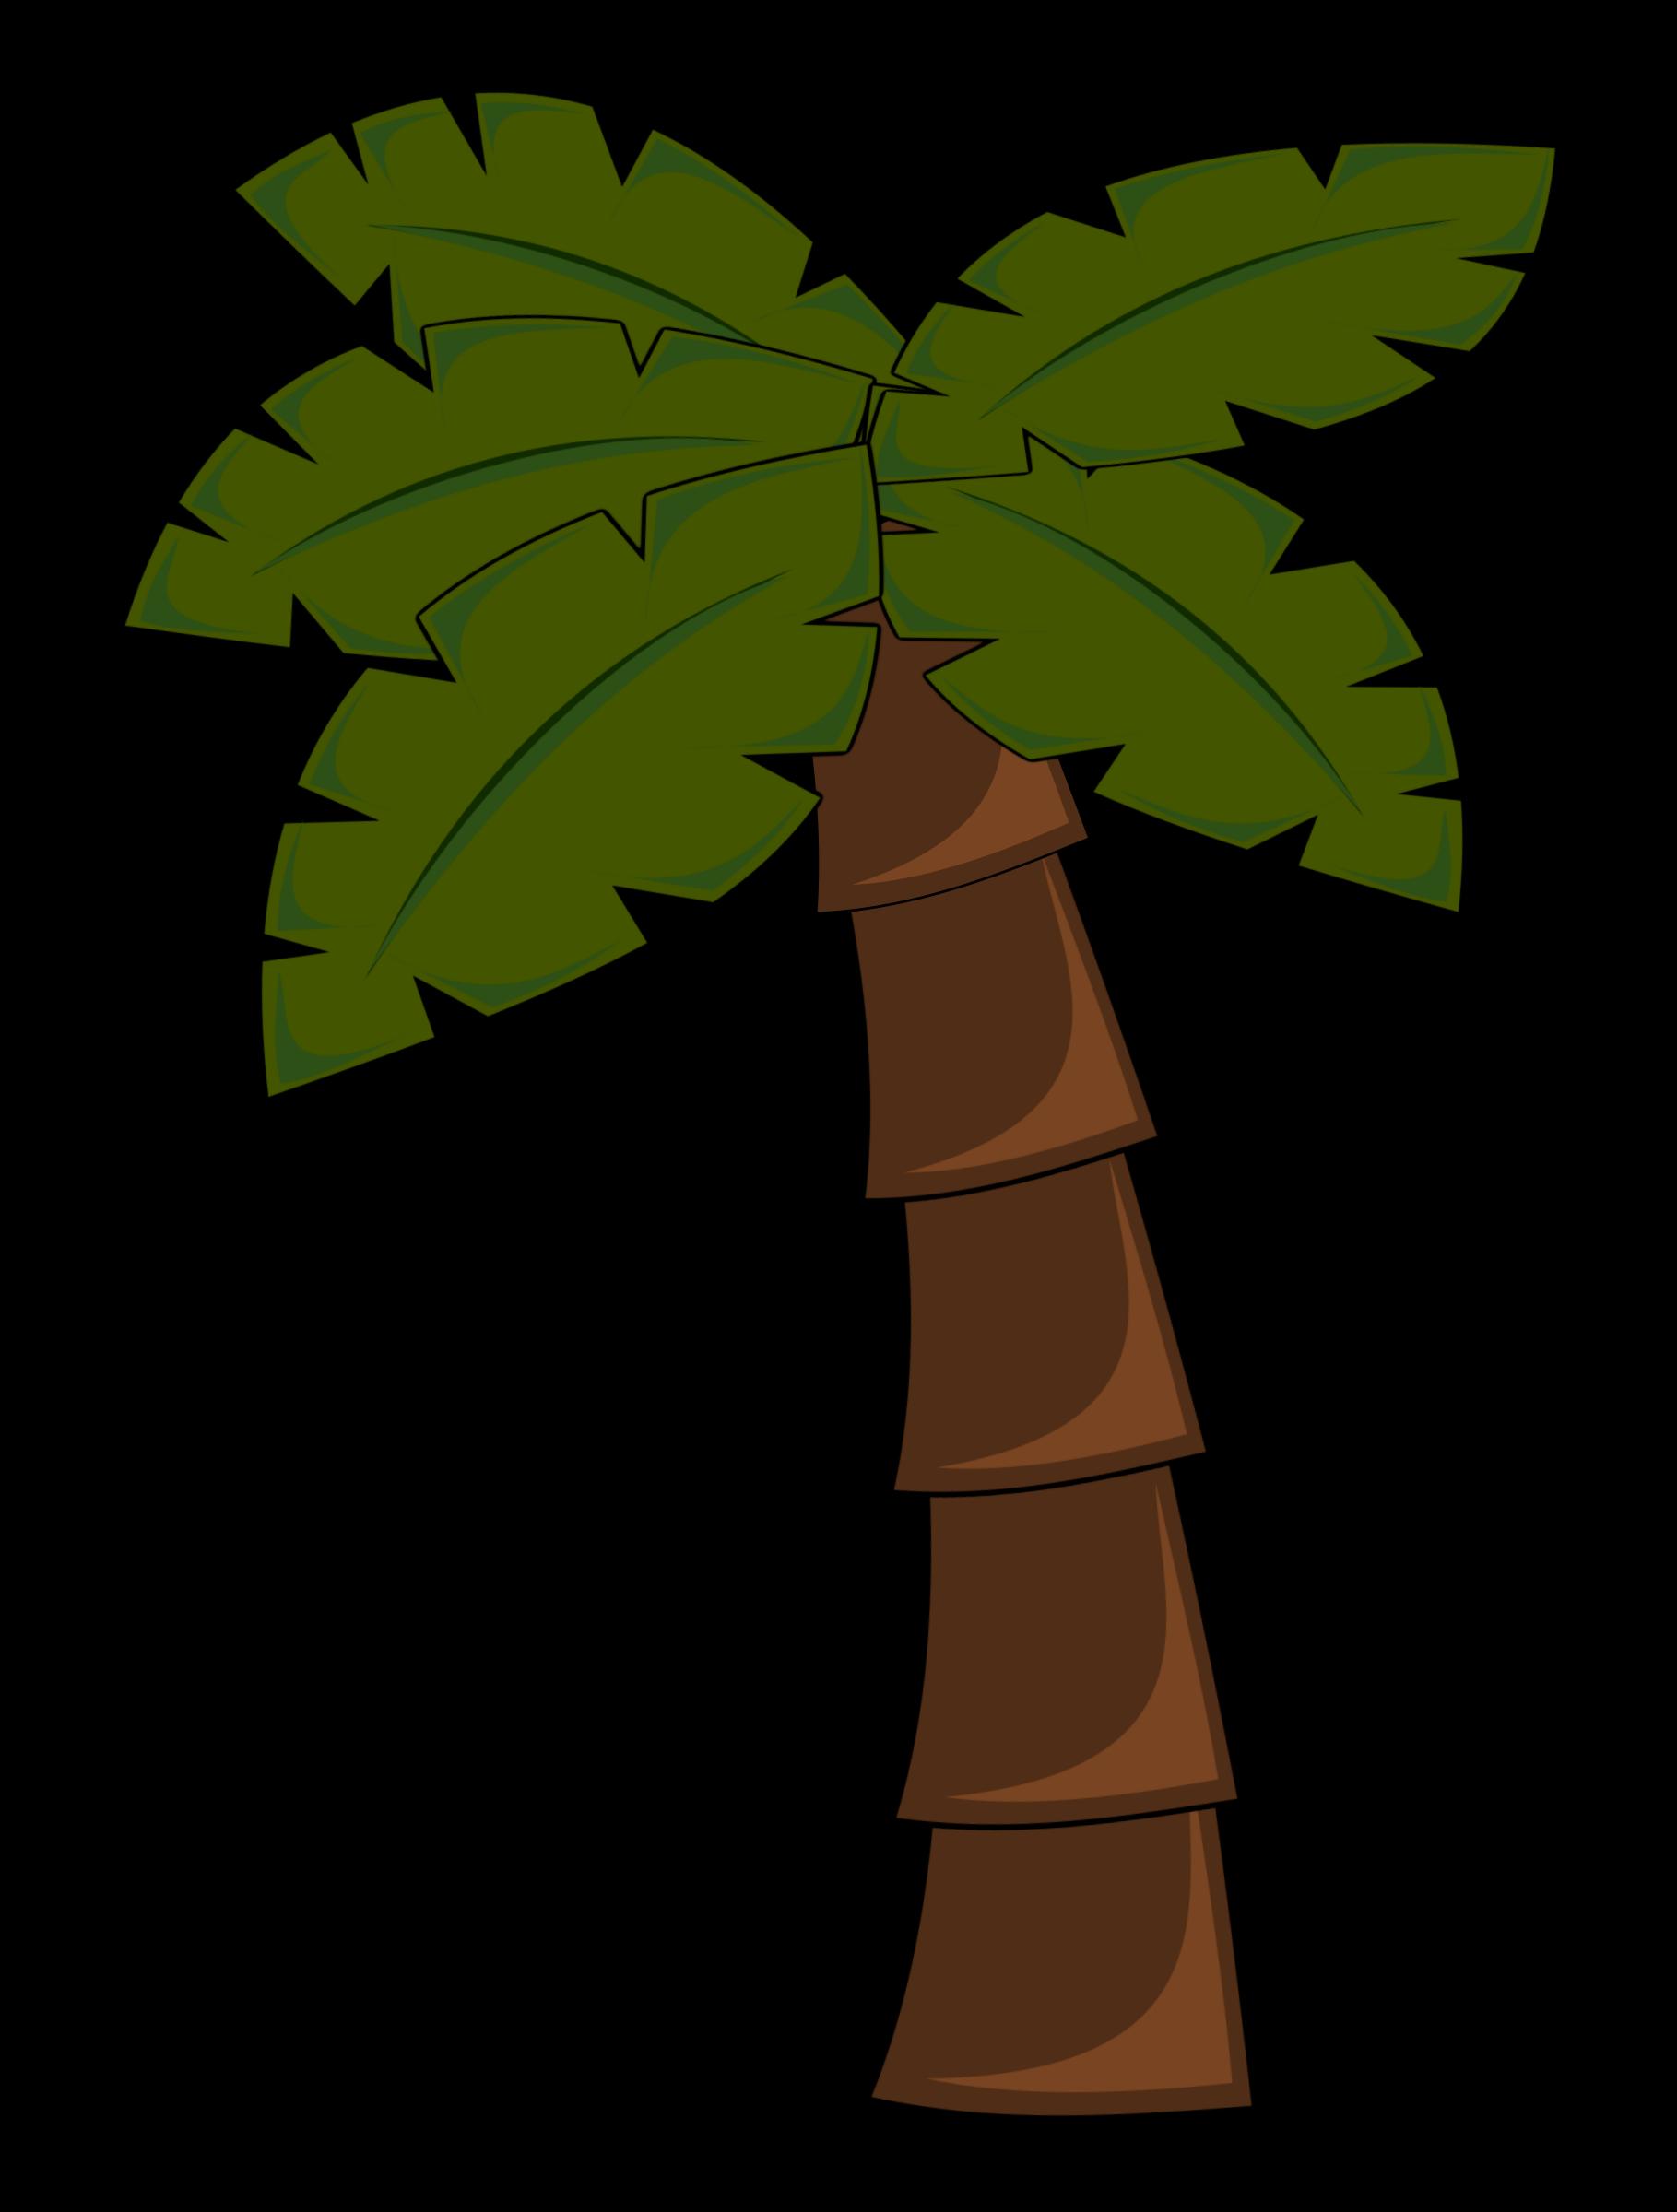 Palm Tree Leaves Drawing Free Image